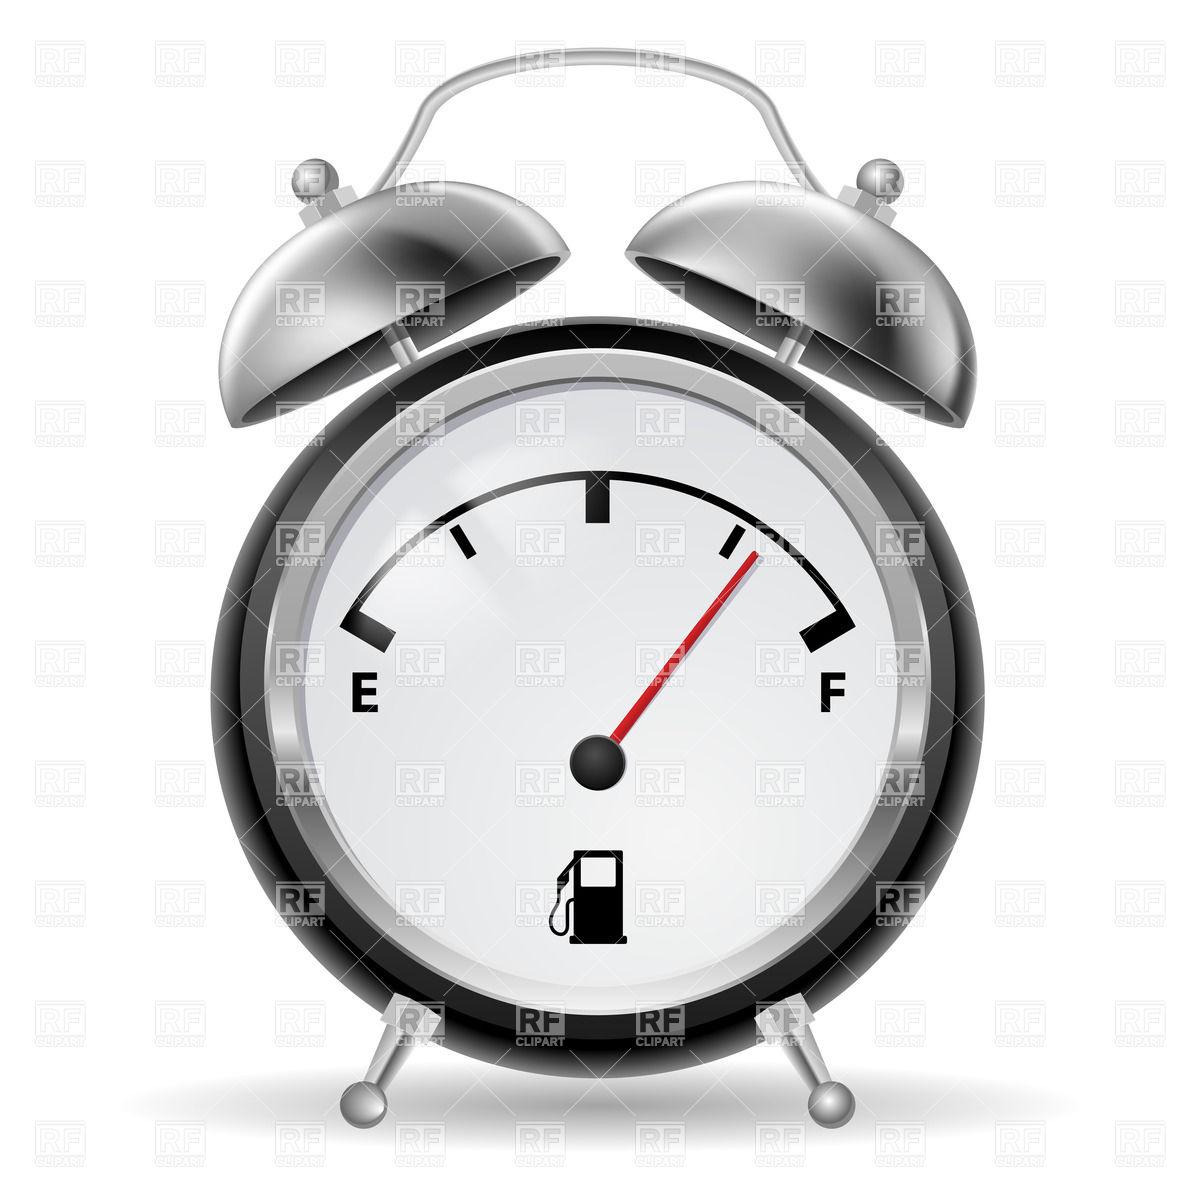 1200x1200 Black And White Fuel Indicator In Retro Alarm Clock Royalty Free